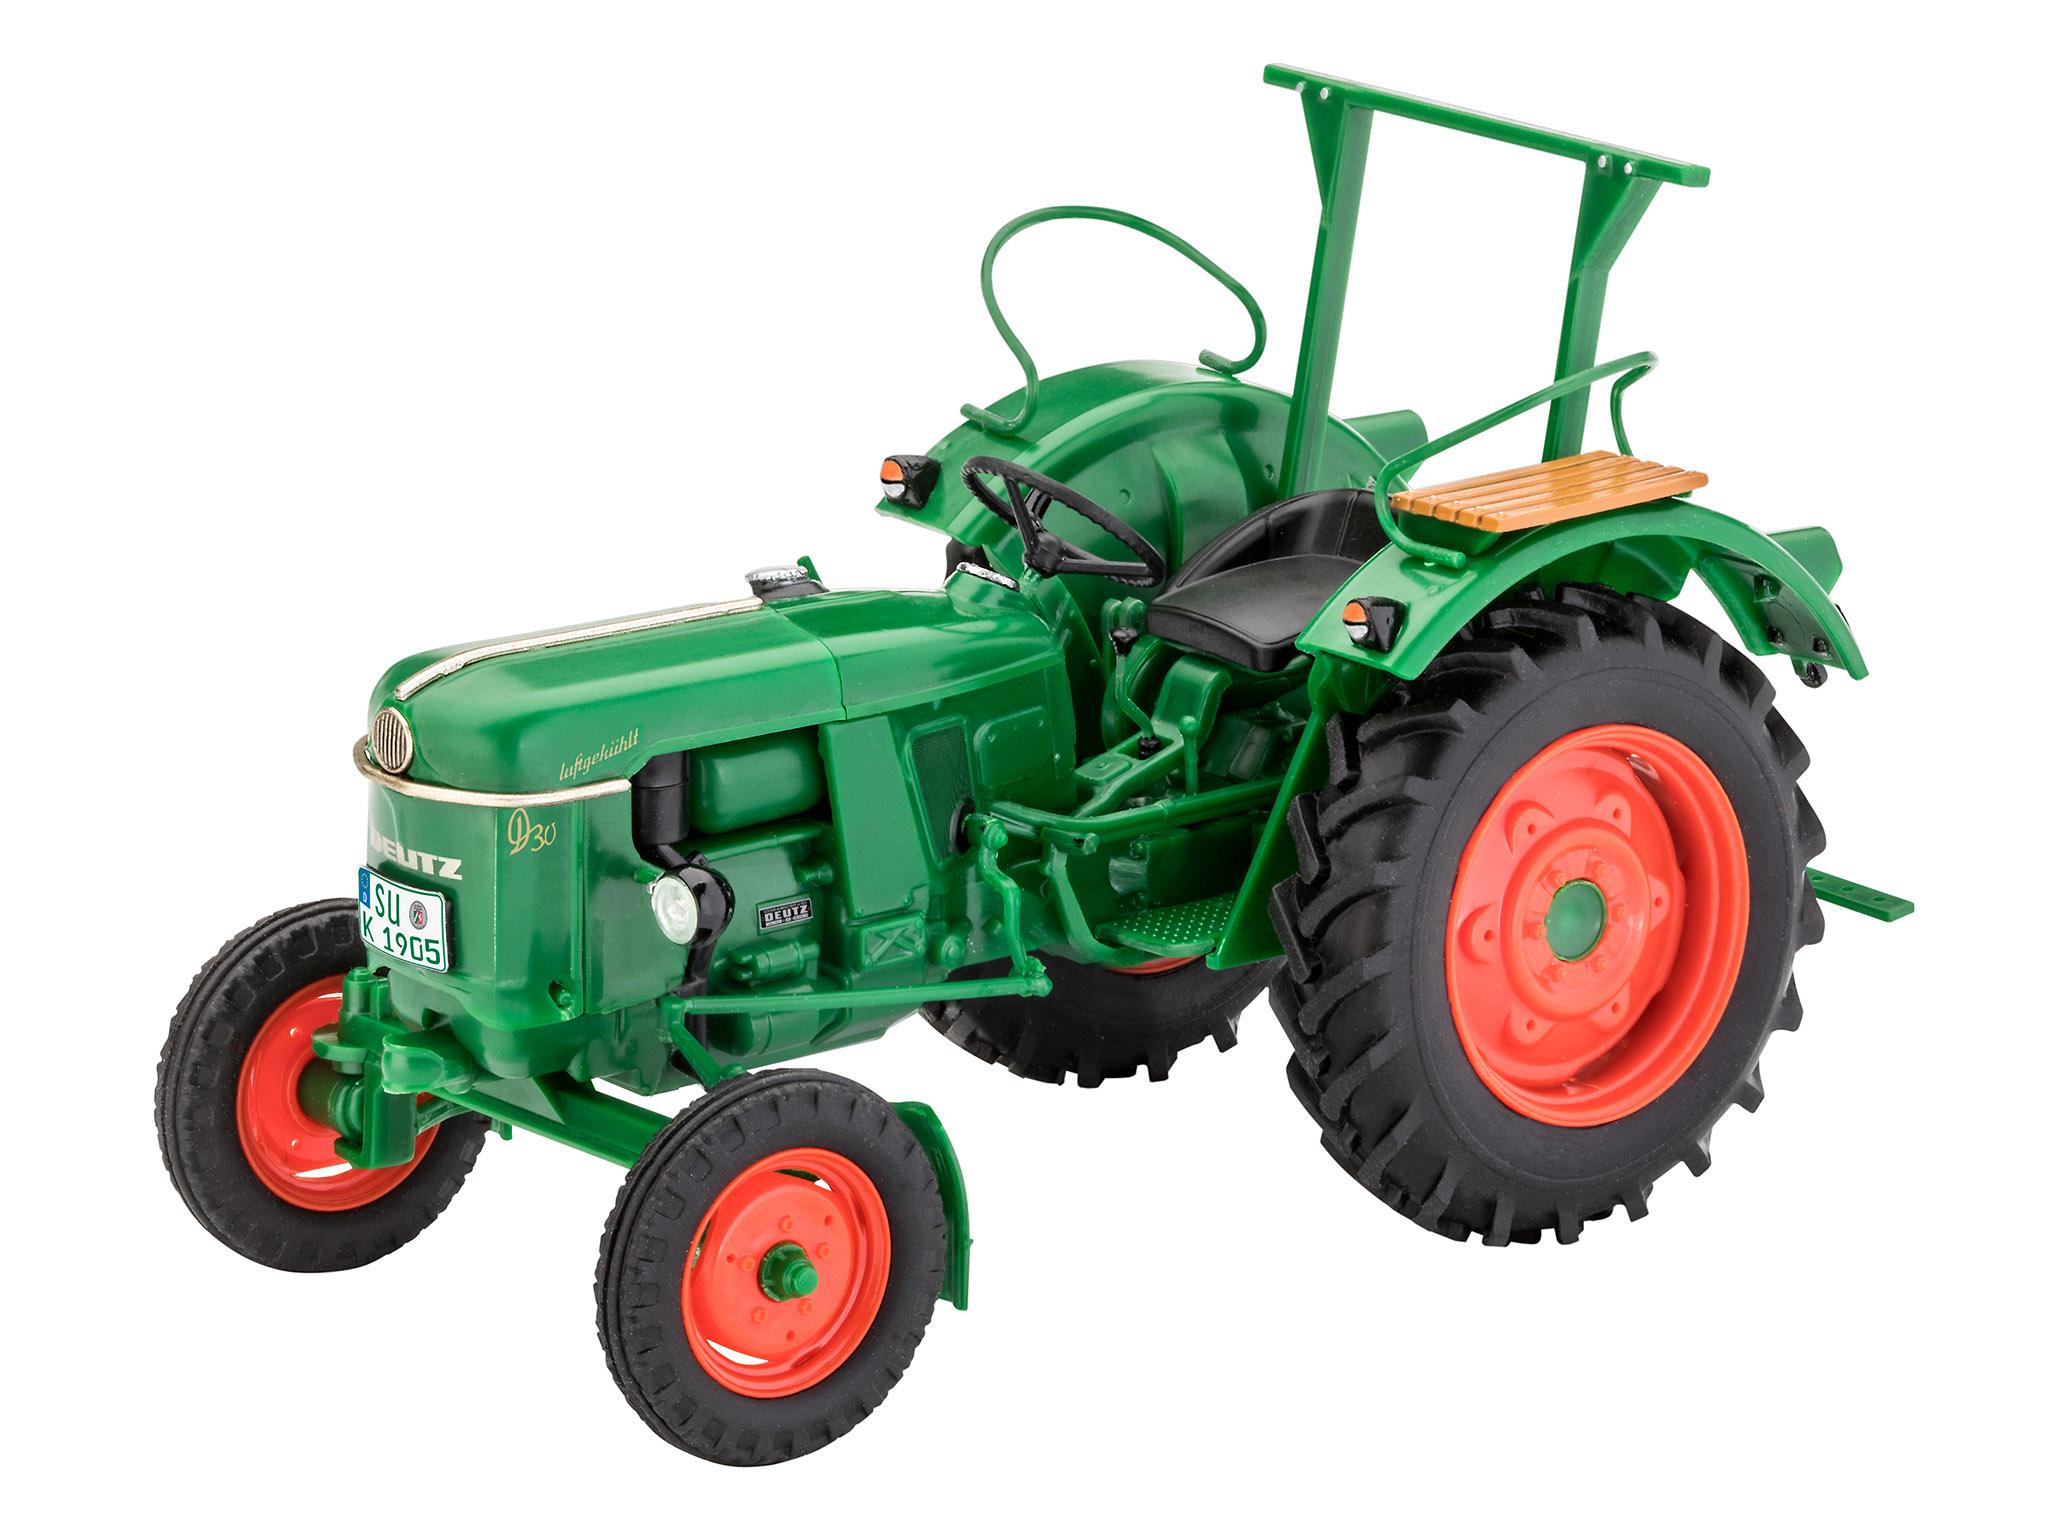 Allgaier R22 1949 Traktor 1:43 Hachette//UH Modellauto